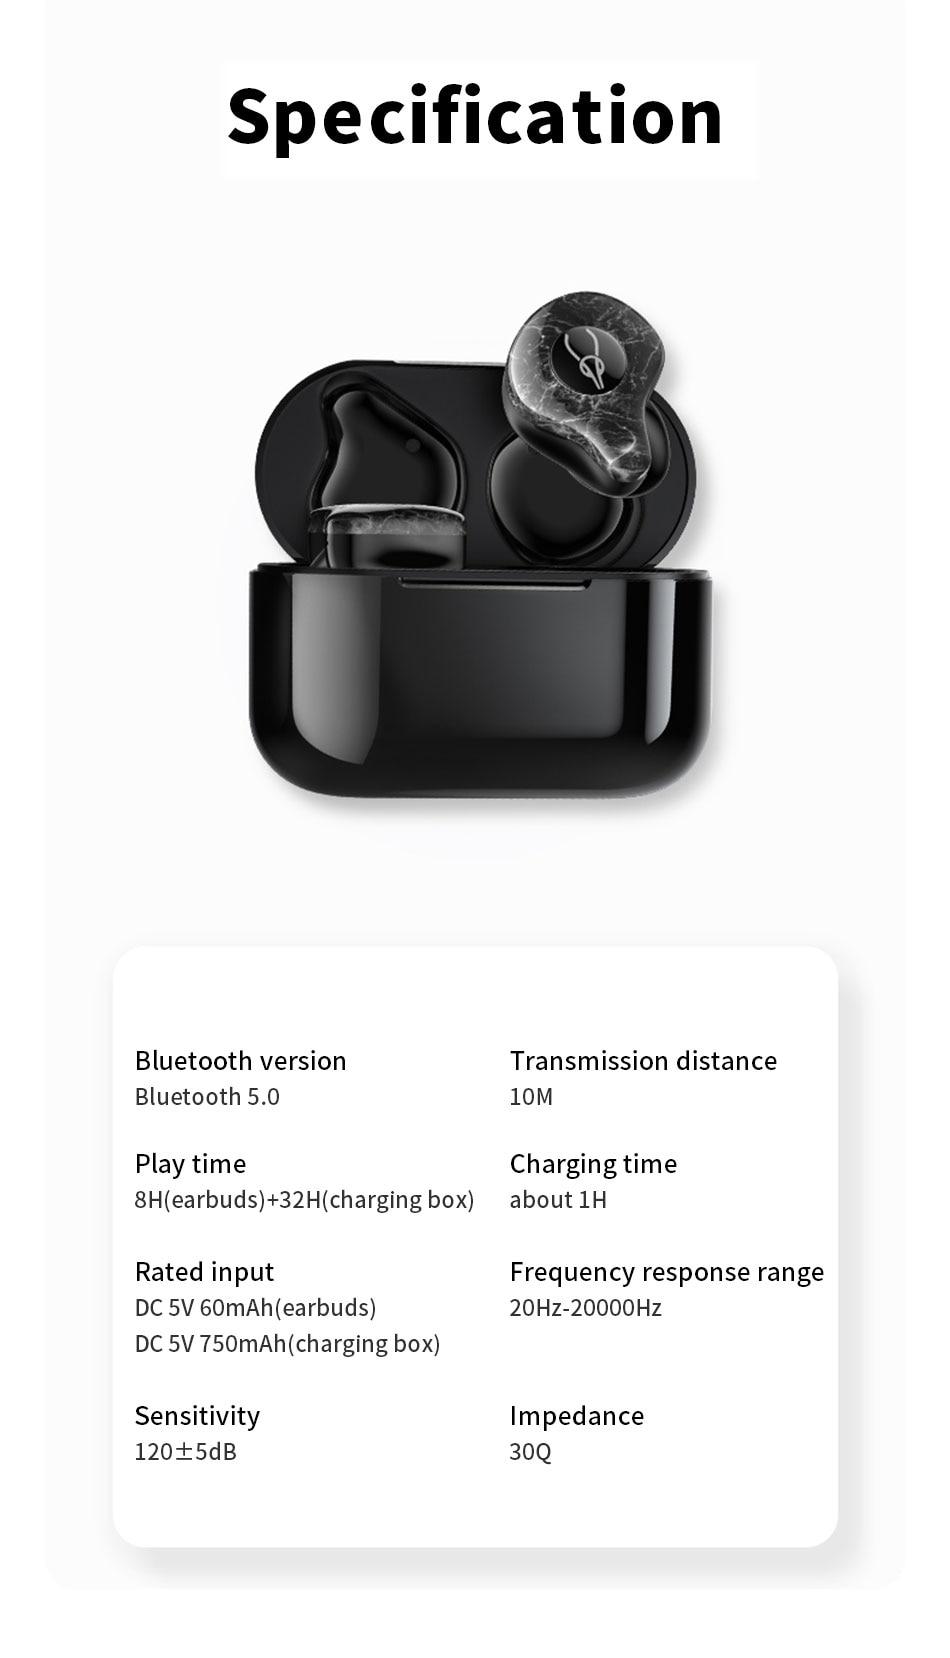 fone de ouvido ipx5 impermeável APX-T áudio 3.7v in-ear